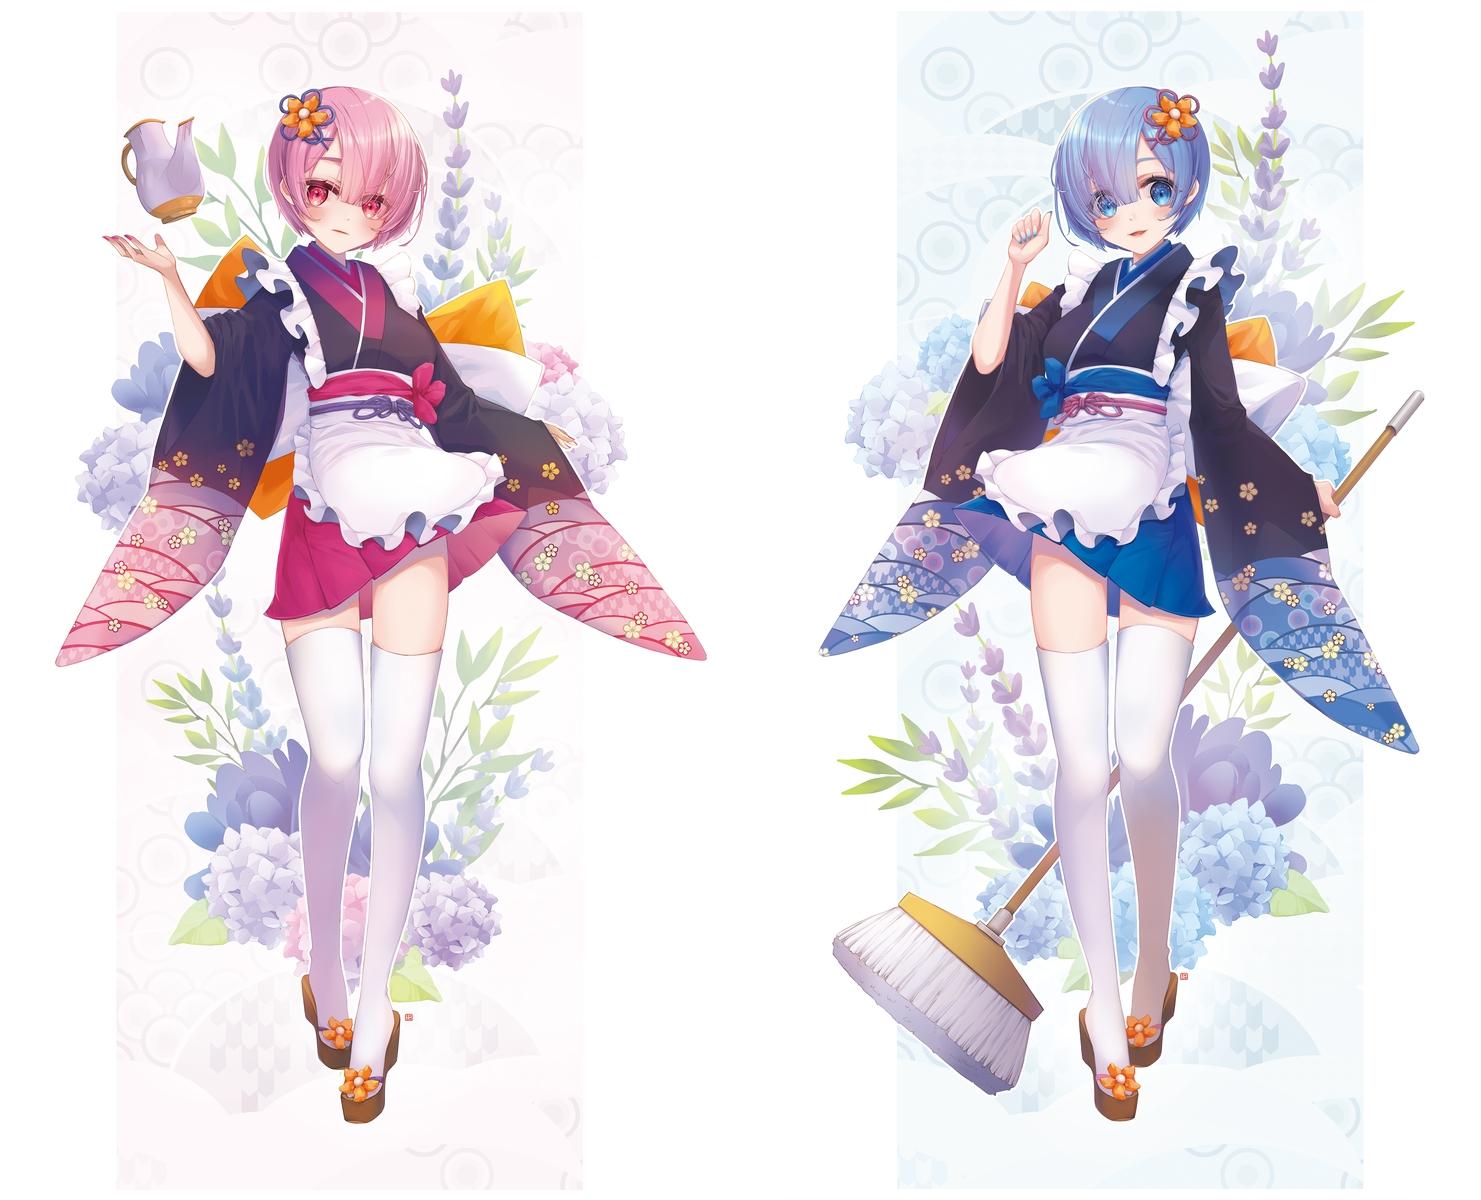 2girls apron blue_hair flowers japanese_clothes jii_dayday kimono maid pink_hair ram_(re:zero) rem_(re:zero) re:zero_kara_hajimeru_isekai_seikatsu short_hair thighhighs twins